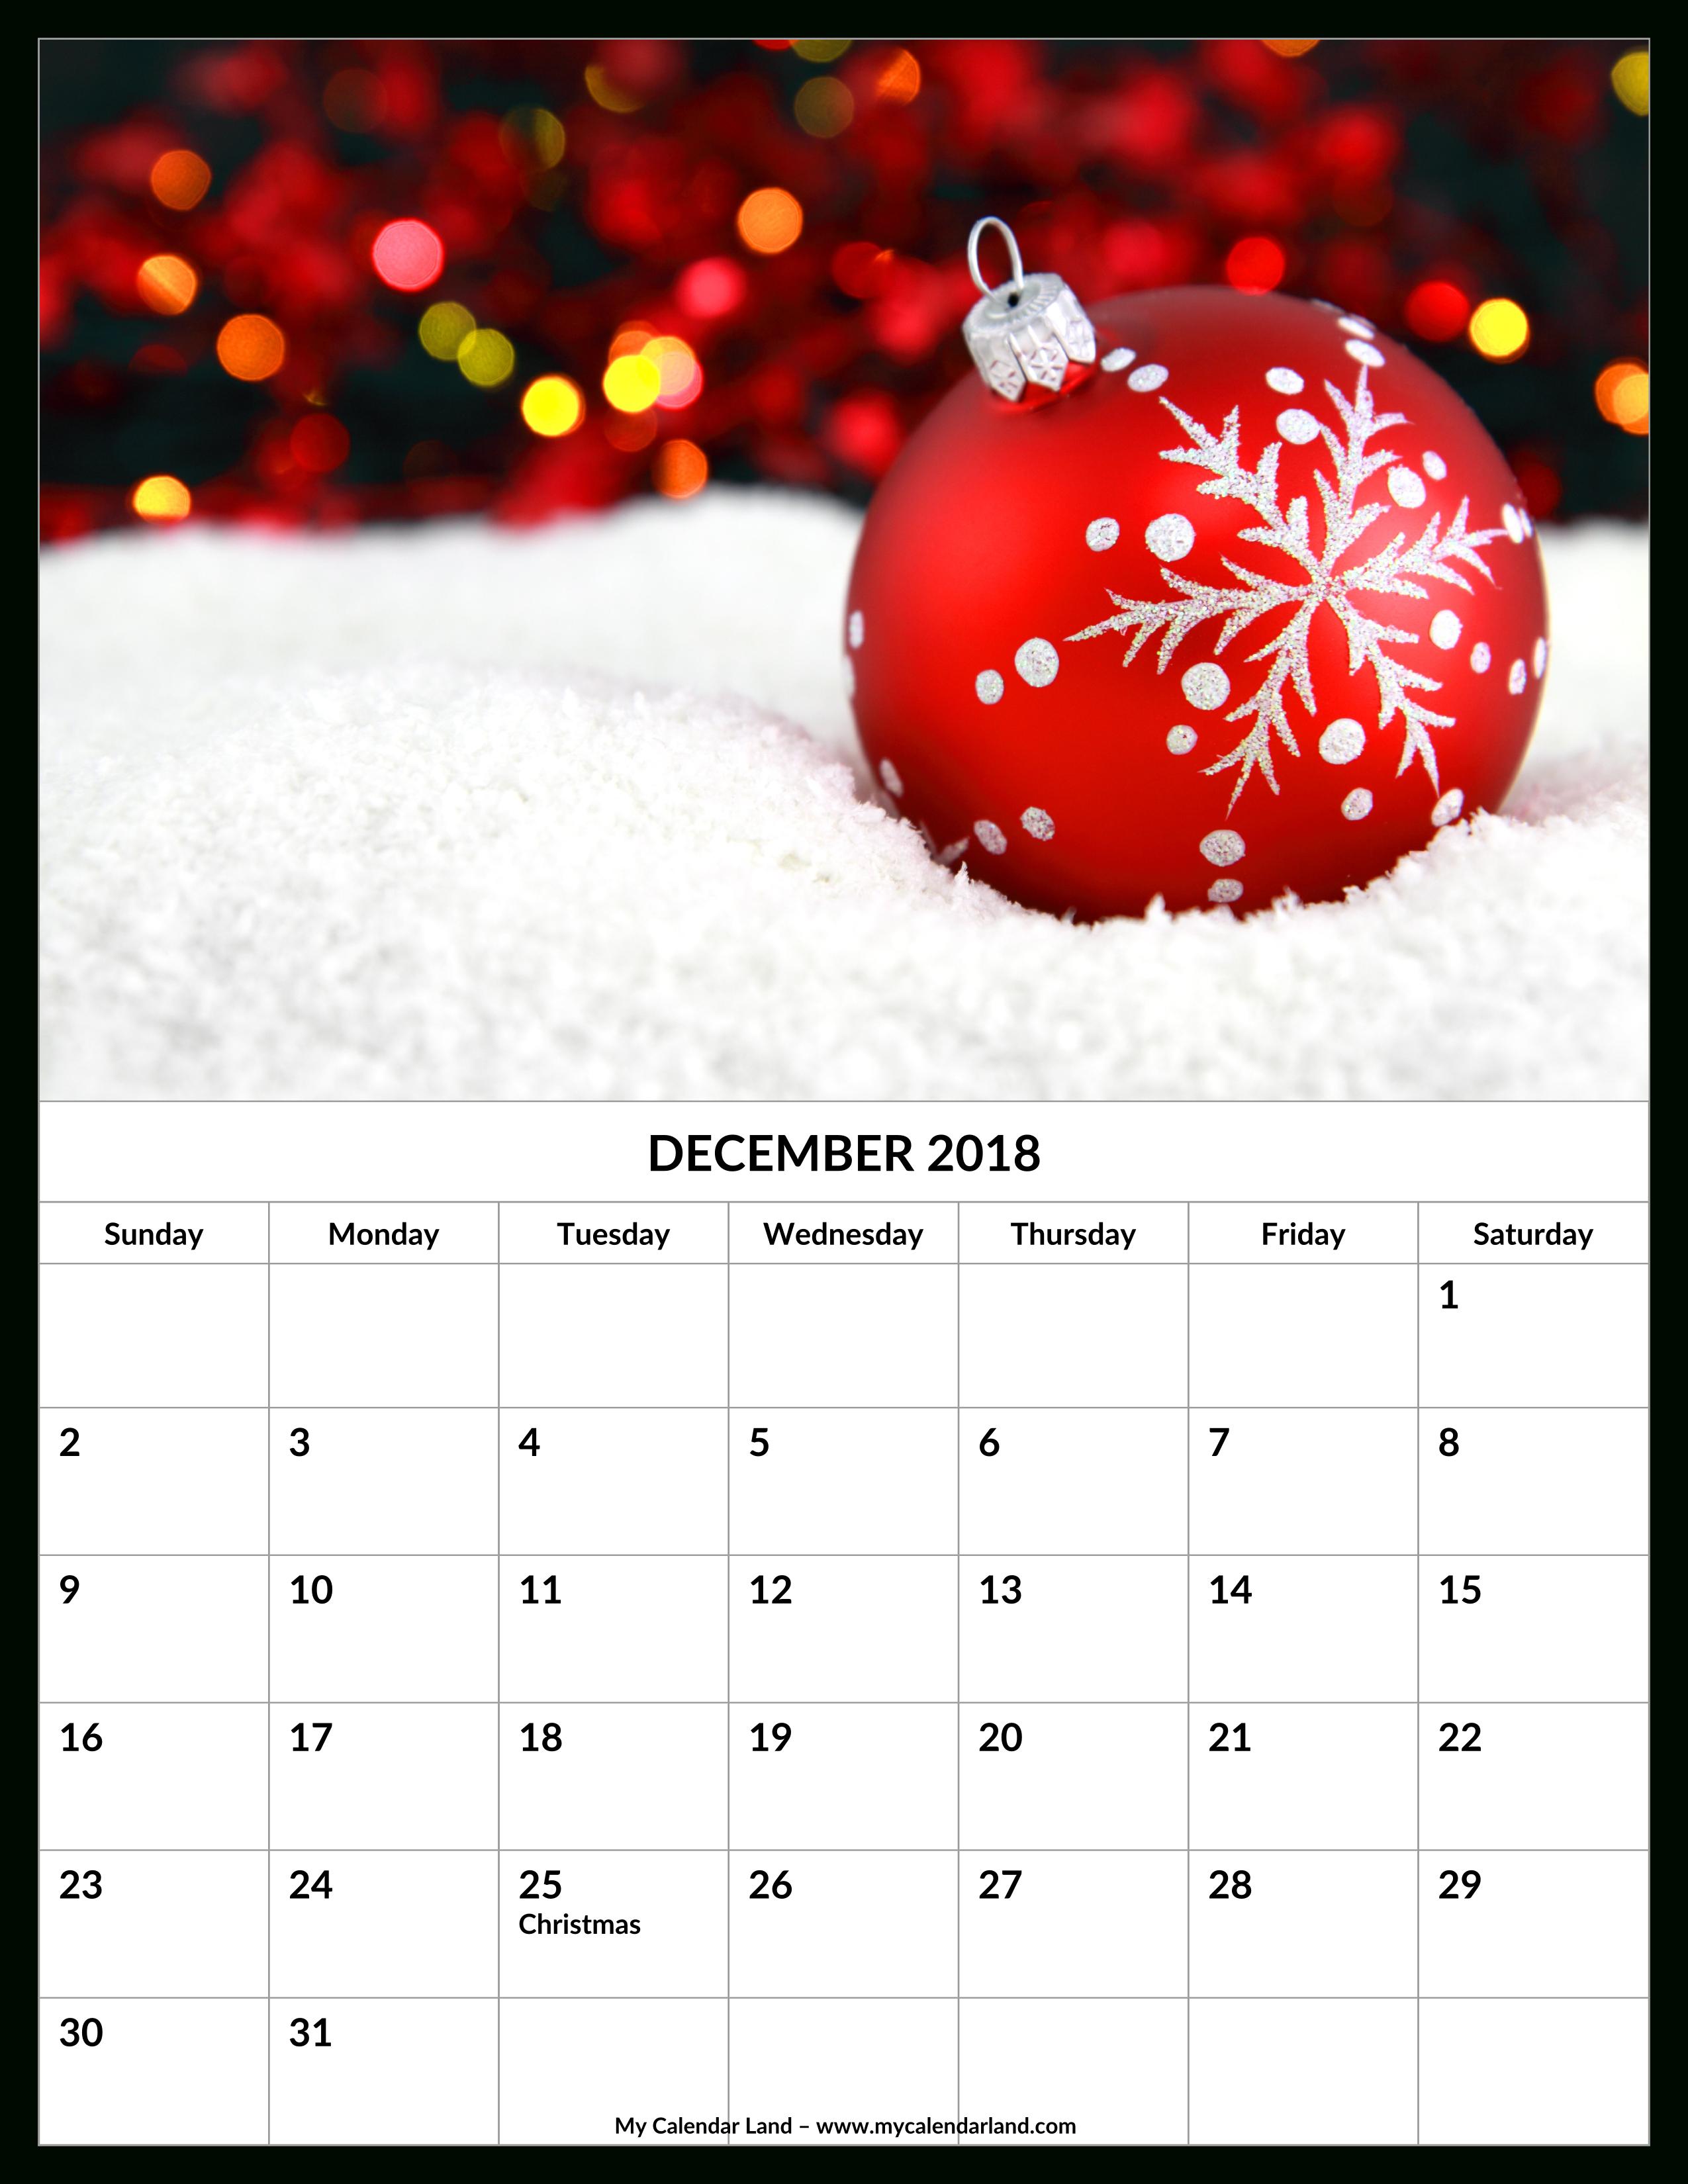 December 2018 Calendar - My Calendar Land inside Christmas Themed Calendar Templates